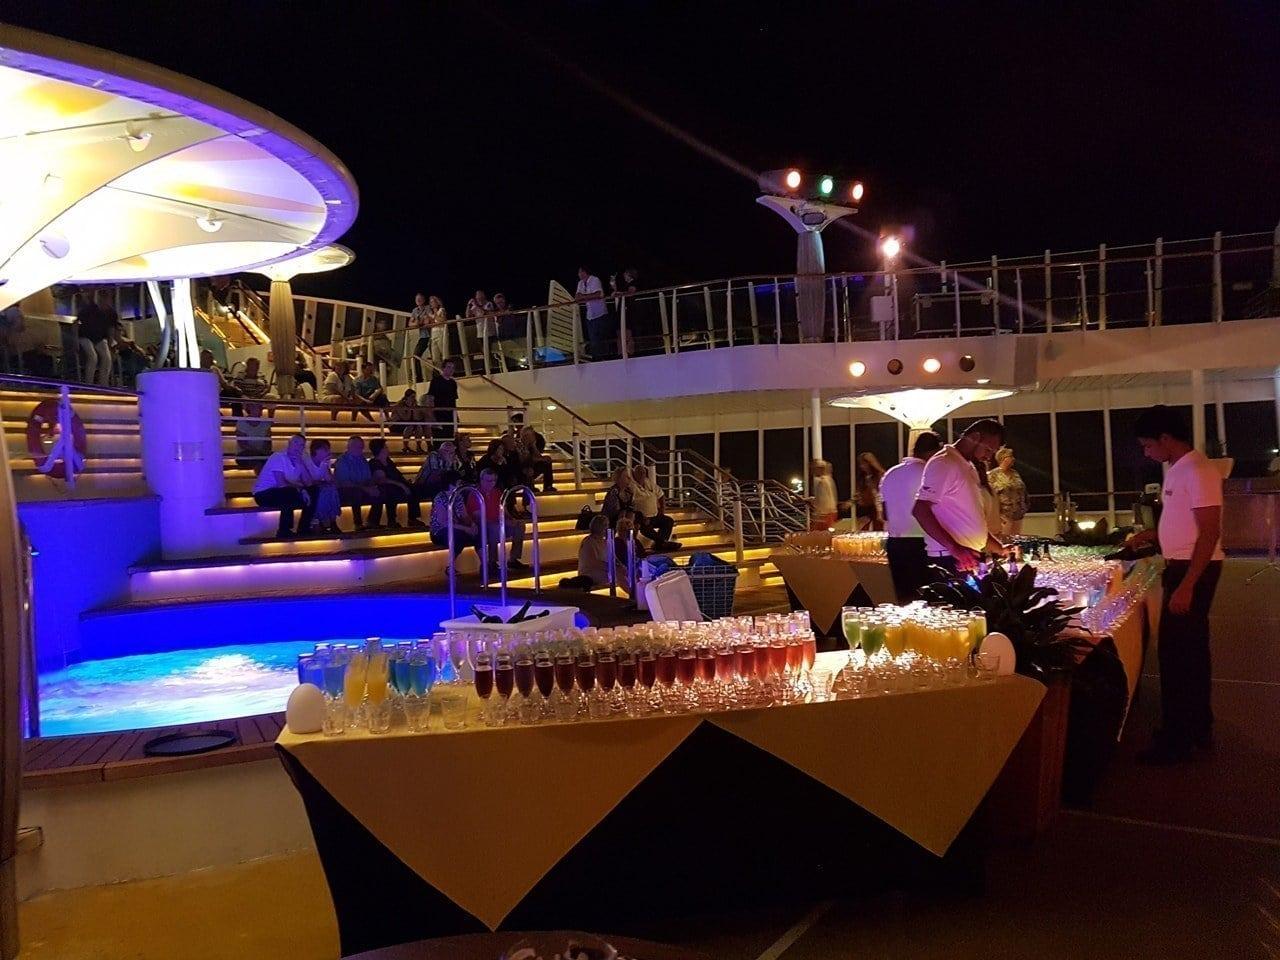 Ankunft in Barbados - Die Transatlantik Kreuzfahrt beginnt 30